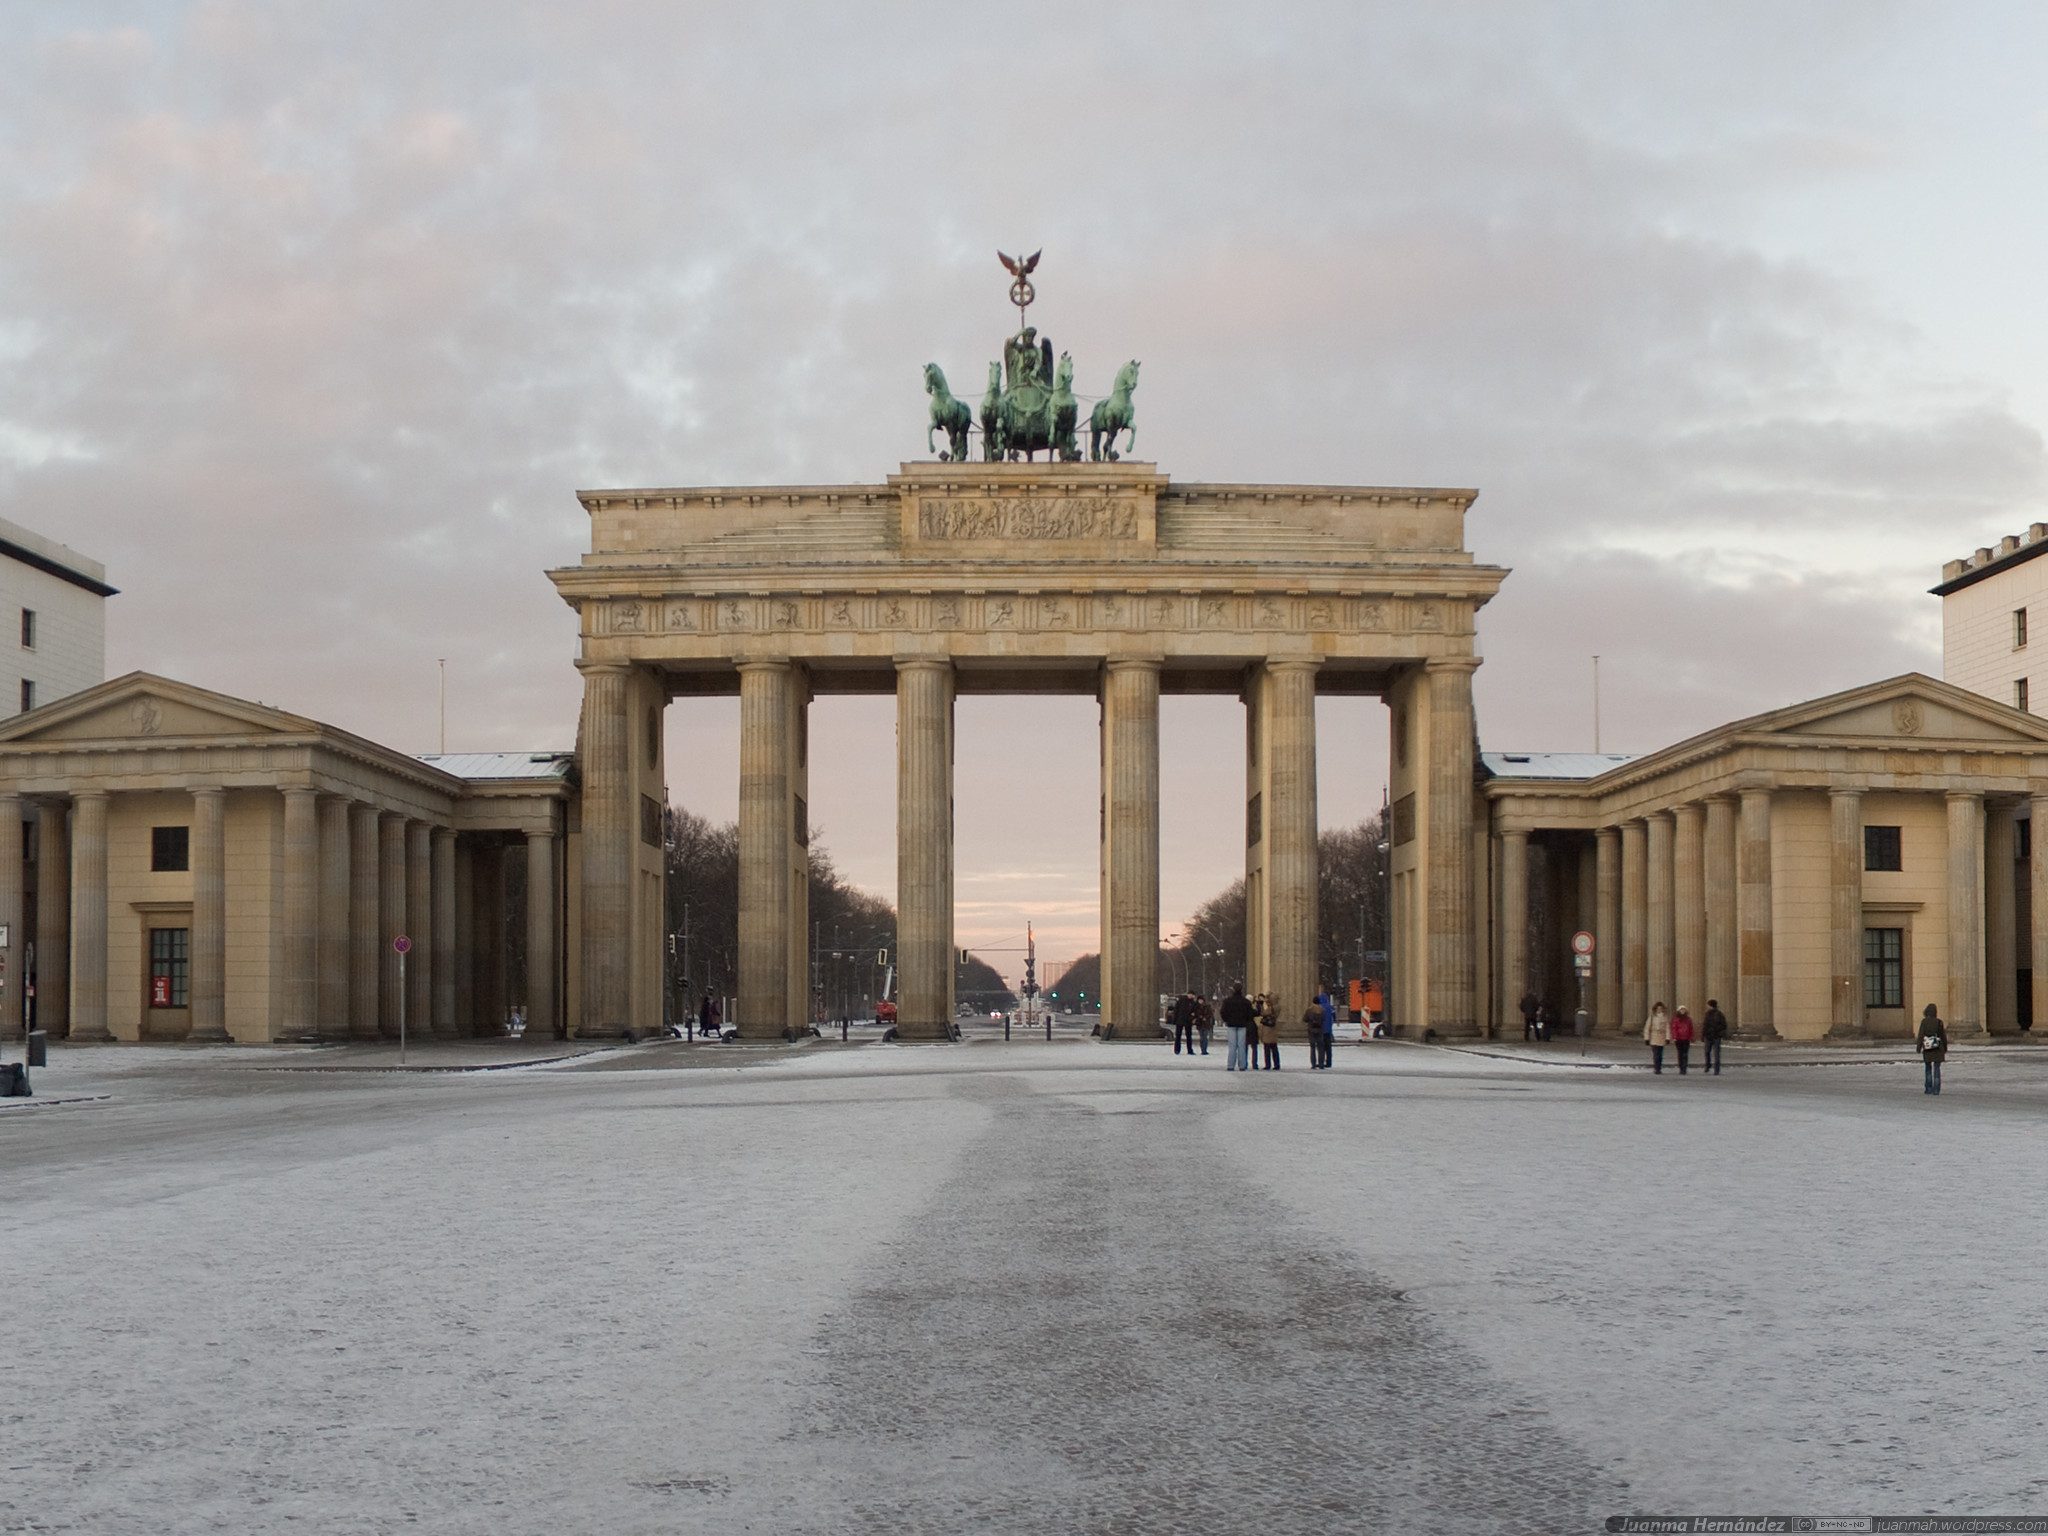 Res: 2048x1536, Brandenburger Tor » Brandenburger Tor-2048×1536